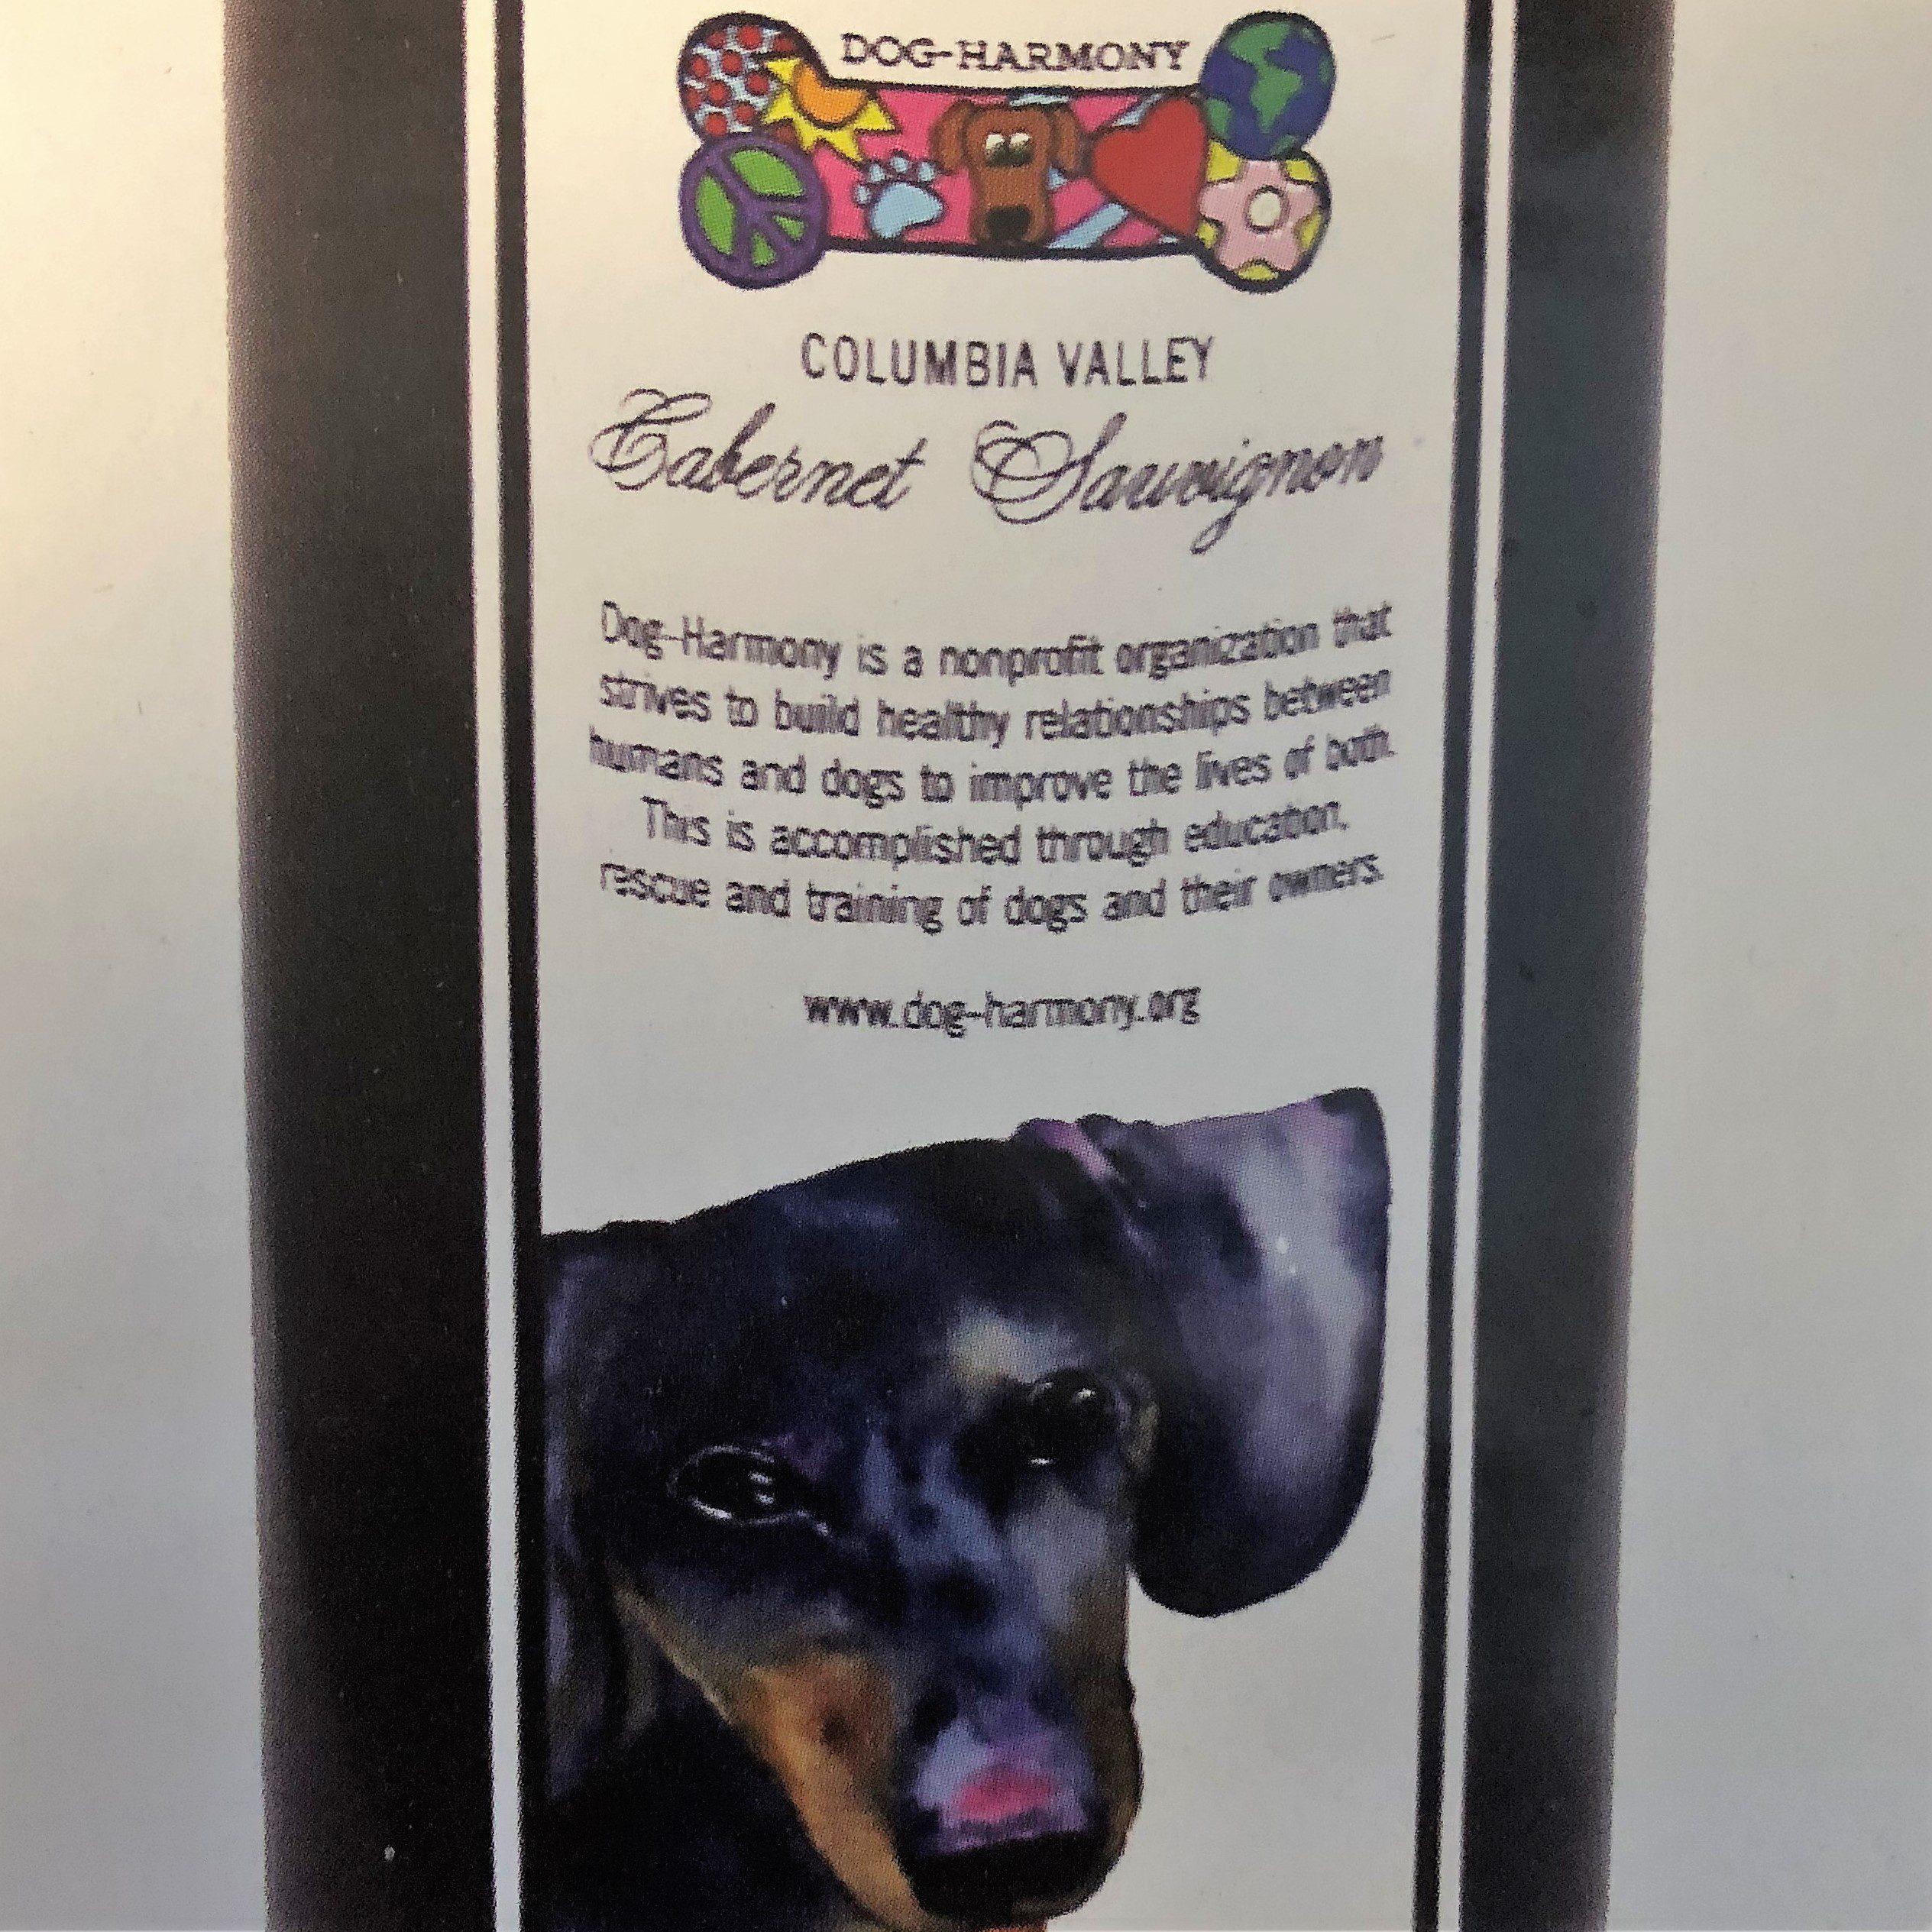 https://dog-harmony.org/wp-content/uploads/2017/12/IMG_0115.jpg